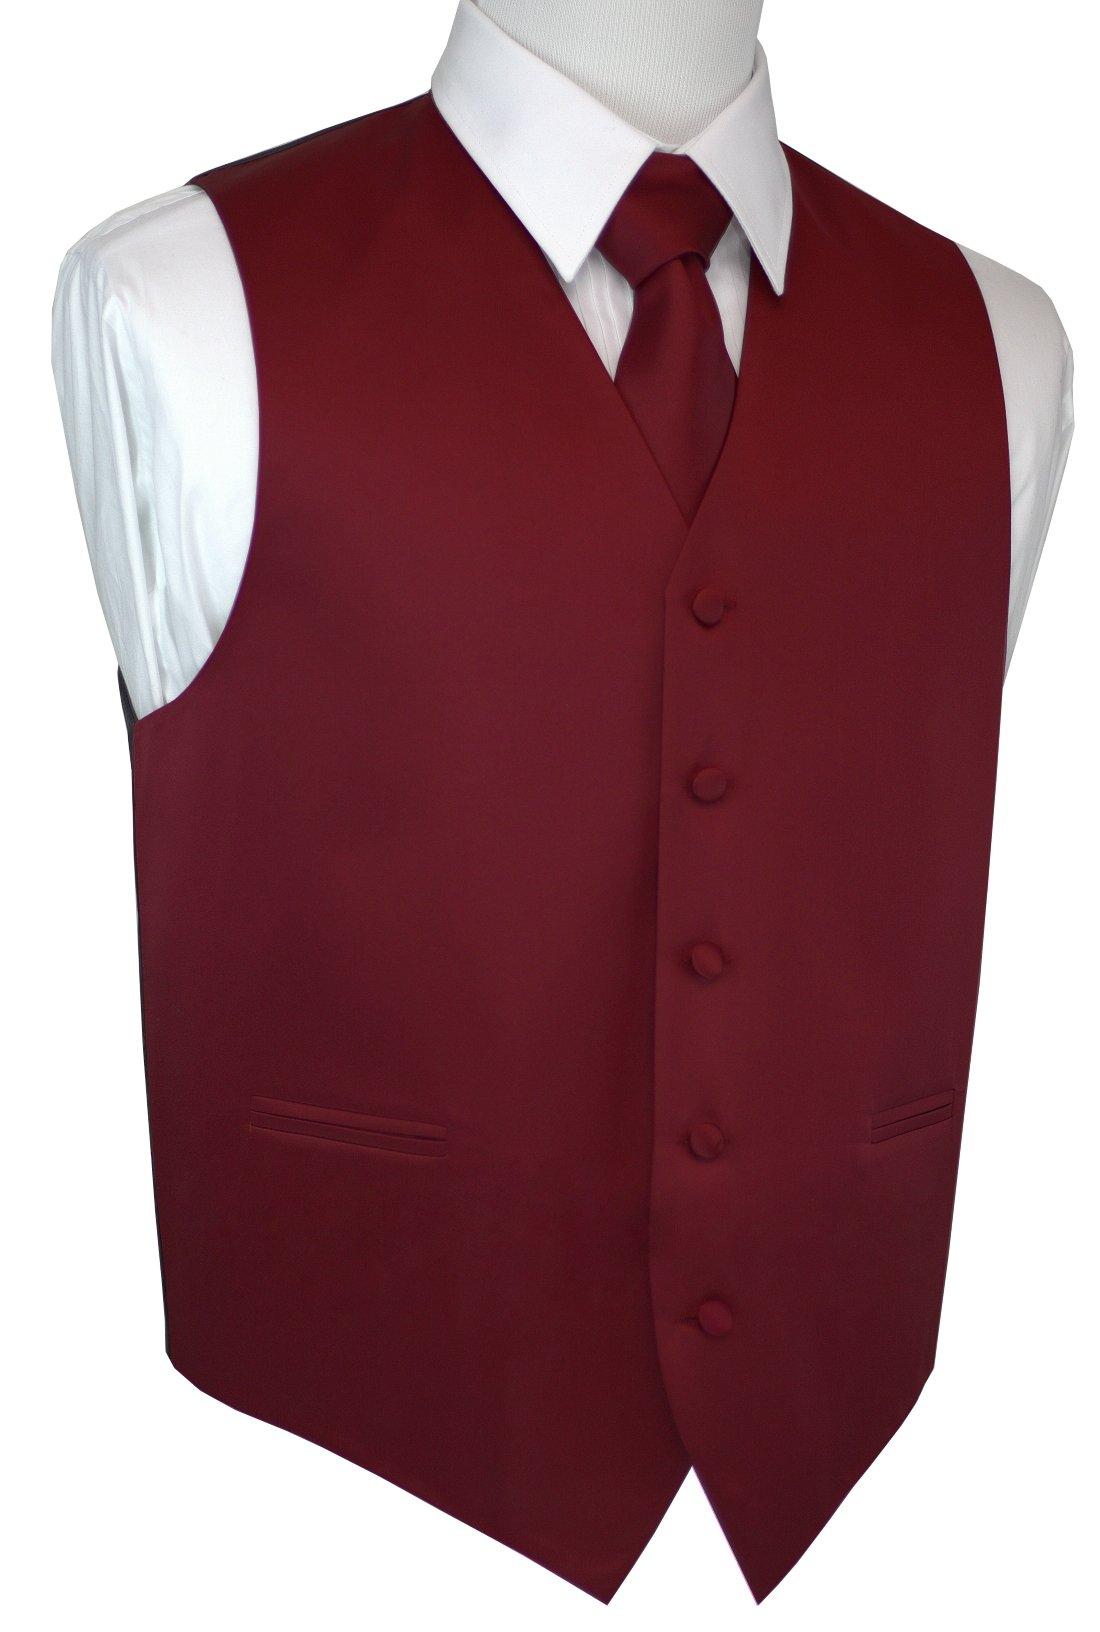 Brand Q Men's Formal Prom Wedding Tuxedo Vest, Tie & Pocket Square Set-Burgundy-3XL